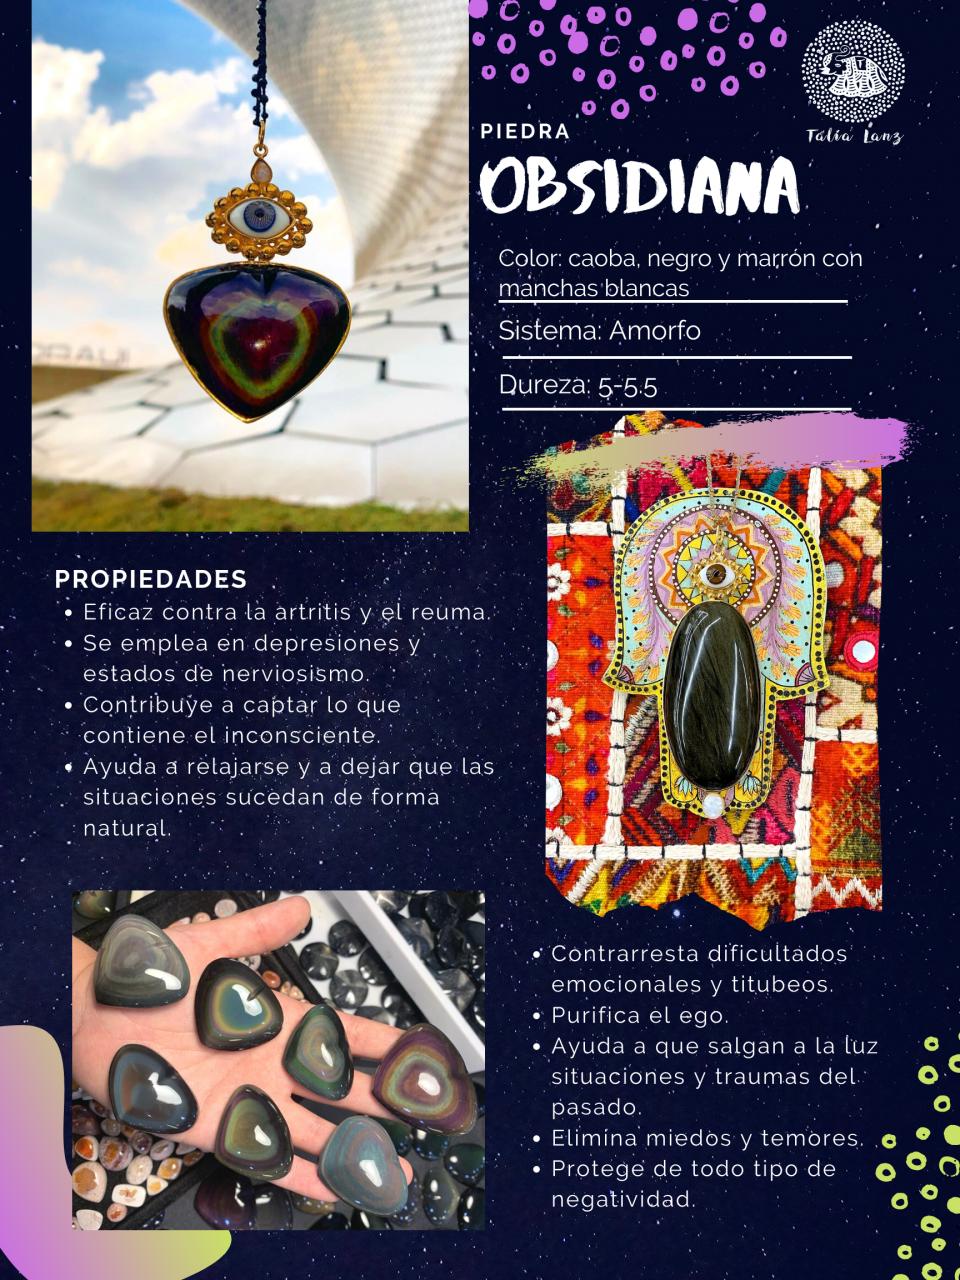 arte de obsidiana